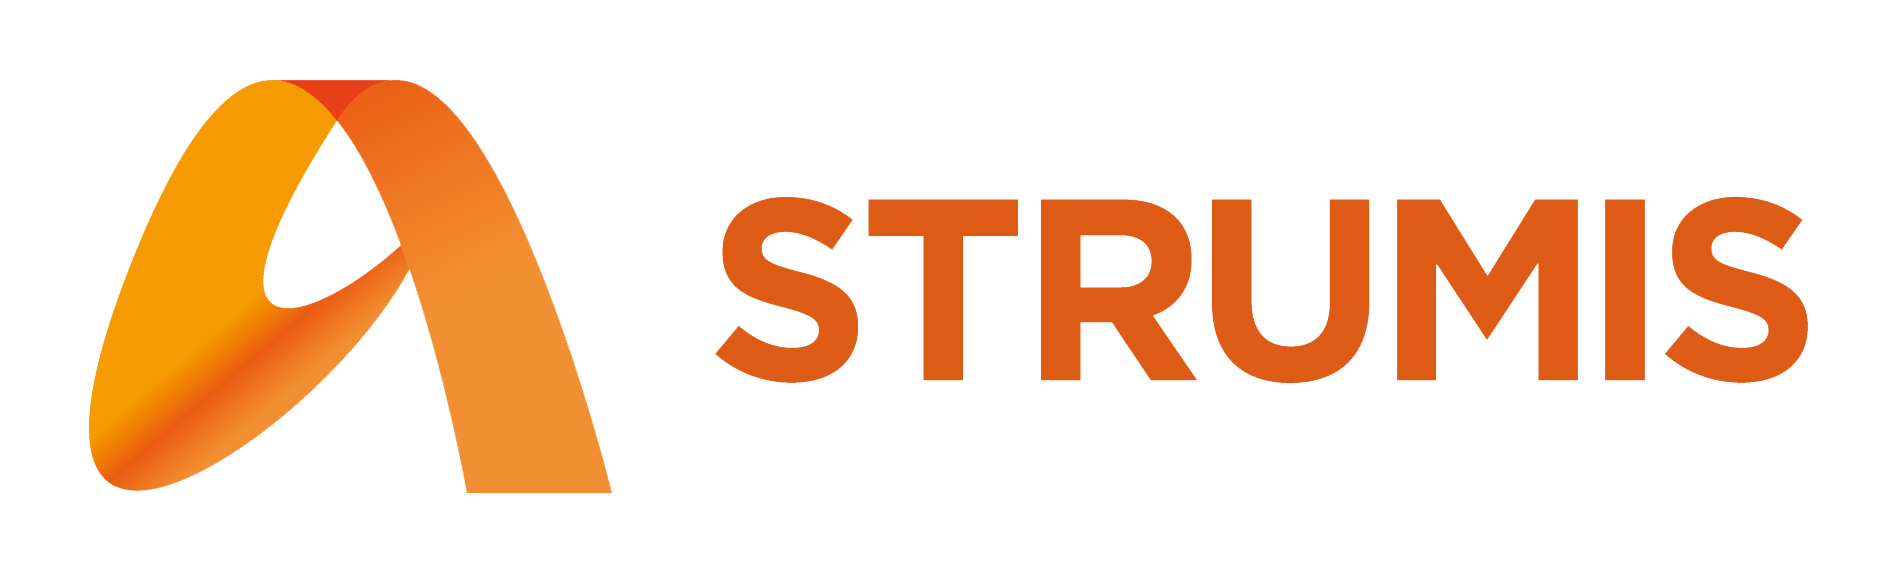 STRUMIS